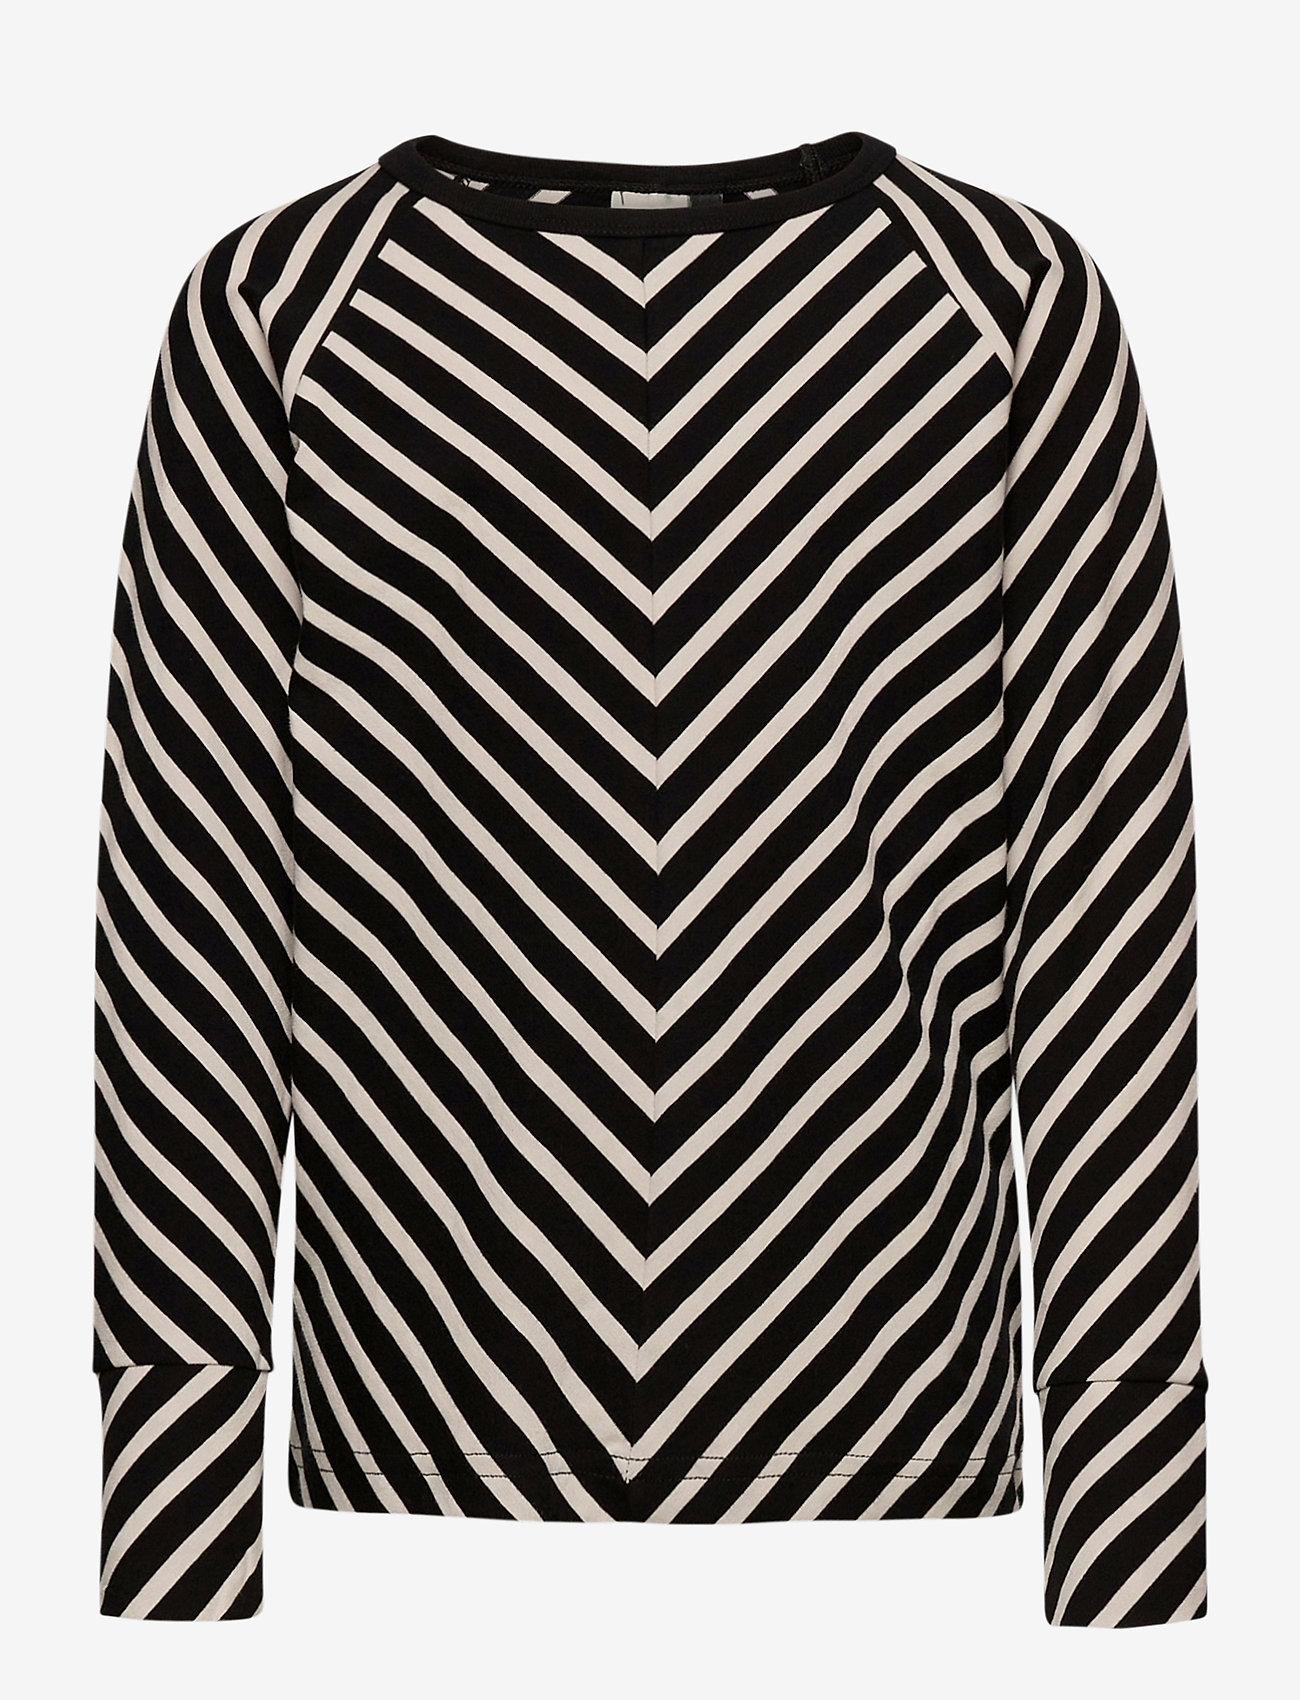 Papu - STRIPE SHIRT KID - sweatshirts - black, sand - 0